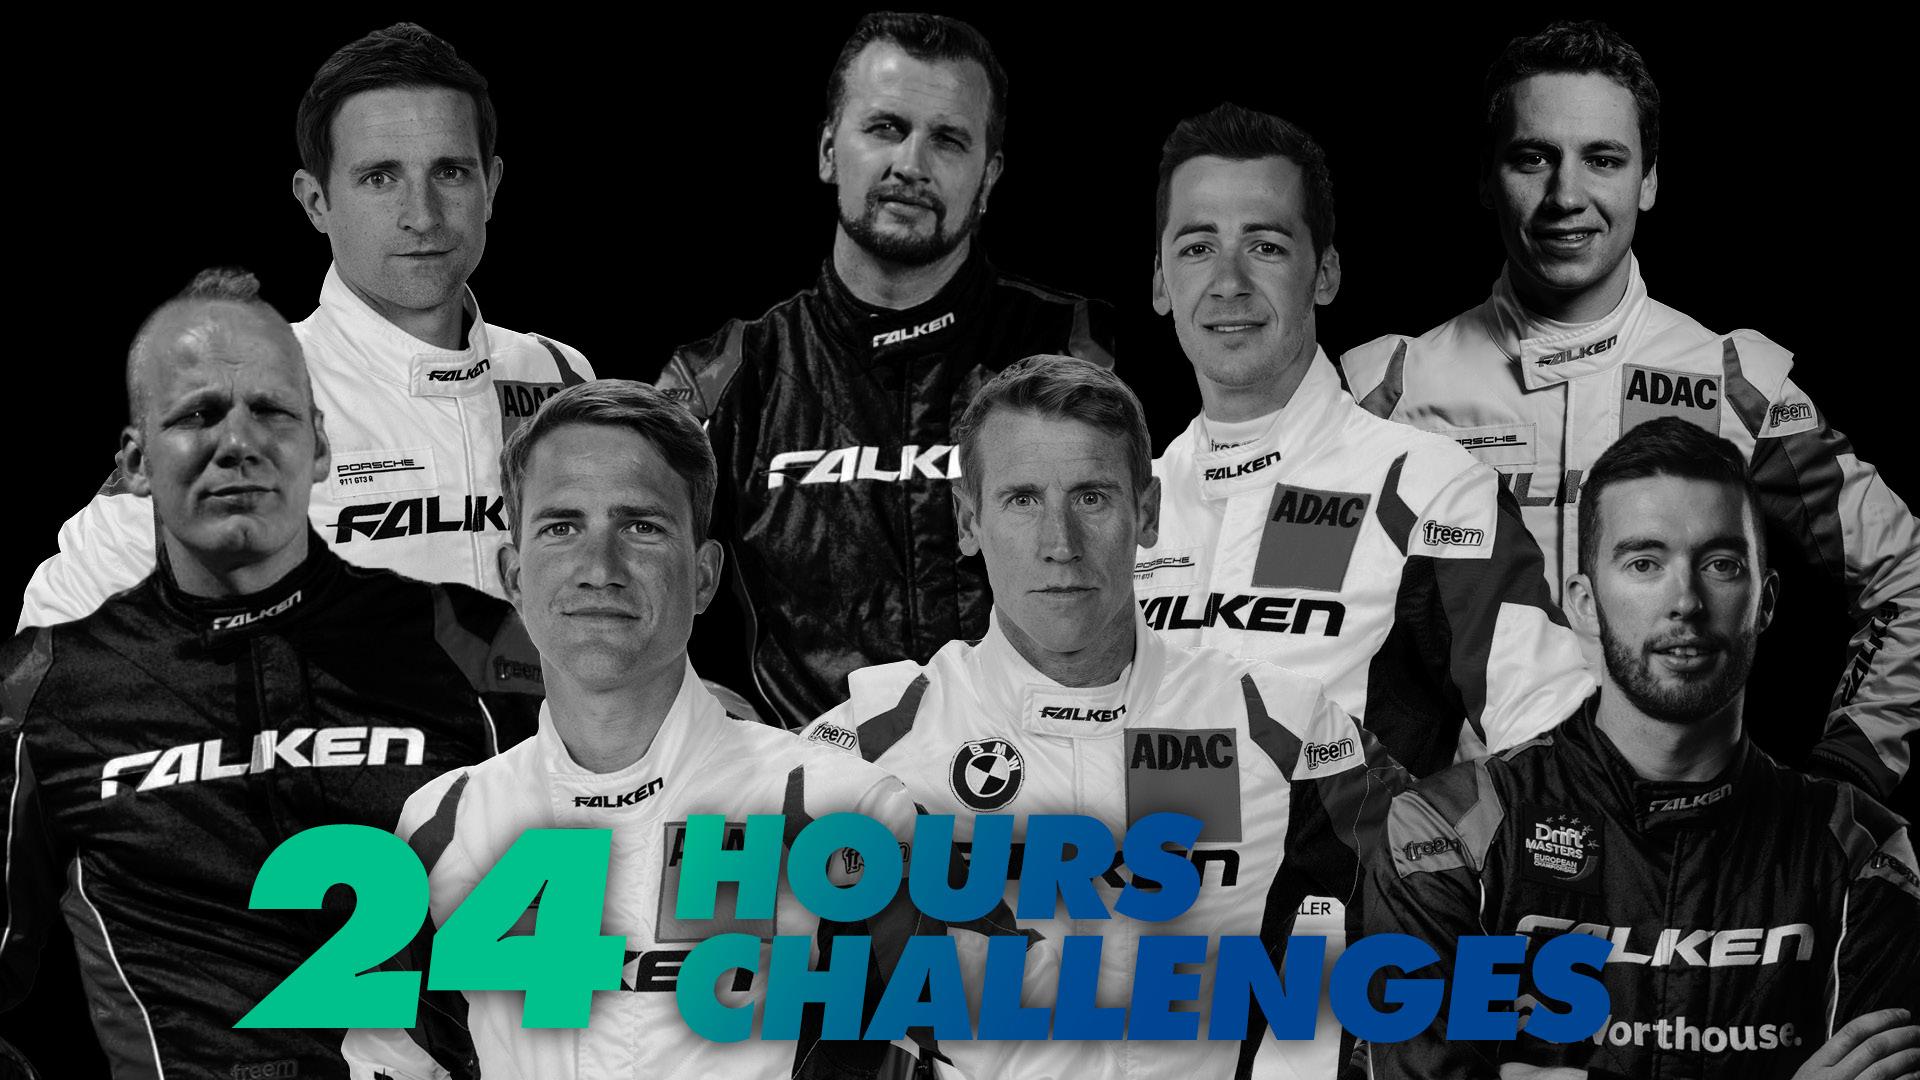 24 challenges in 24 hours for Falken